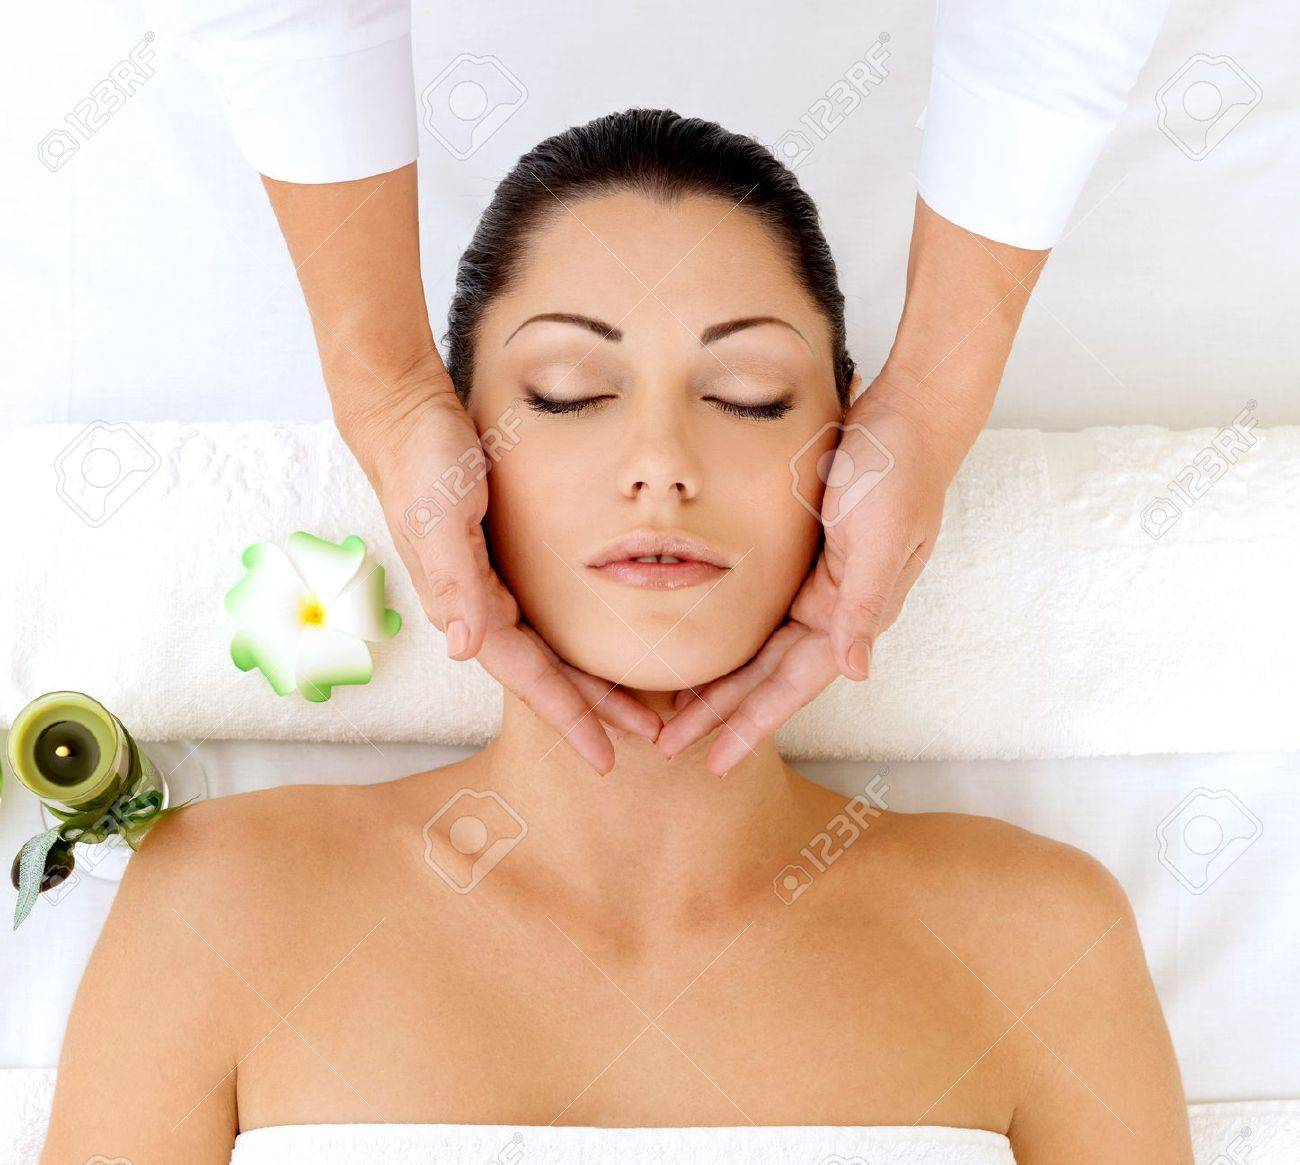 Woman having massage of head in the spa salon. Beauty treatment concept. Stock Photo - 17853349